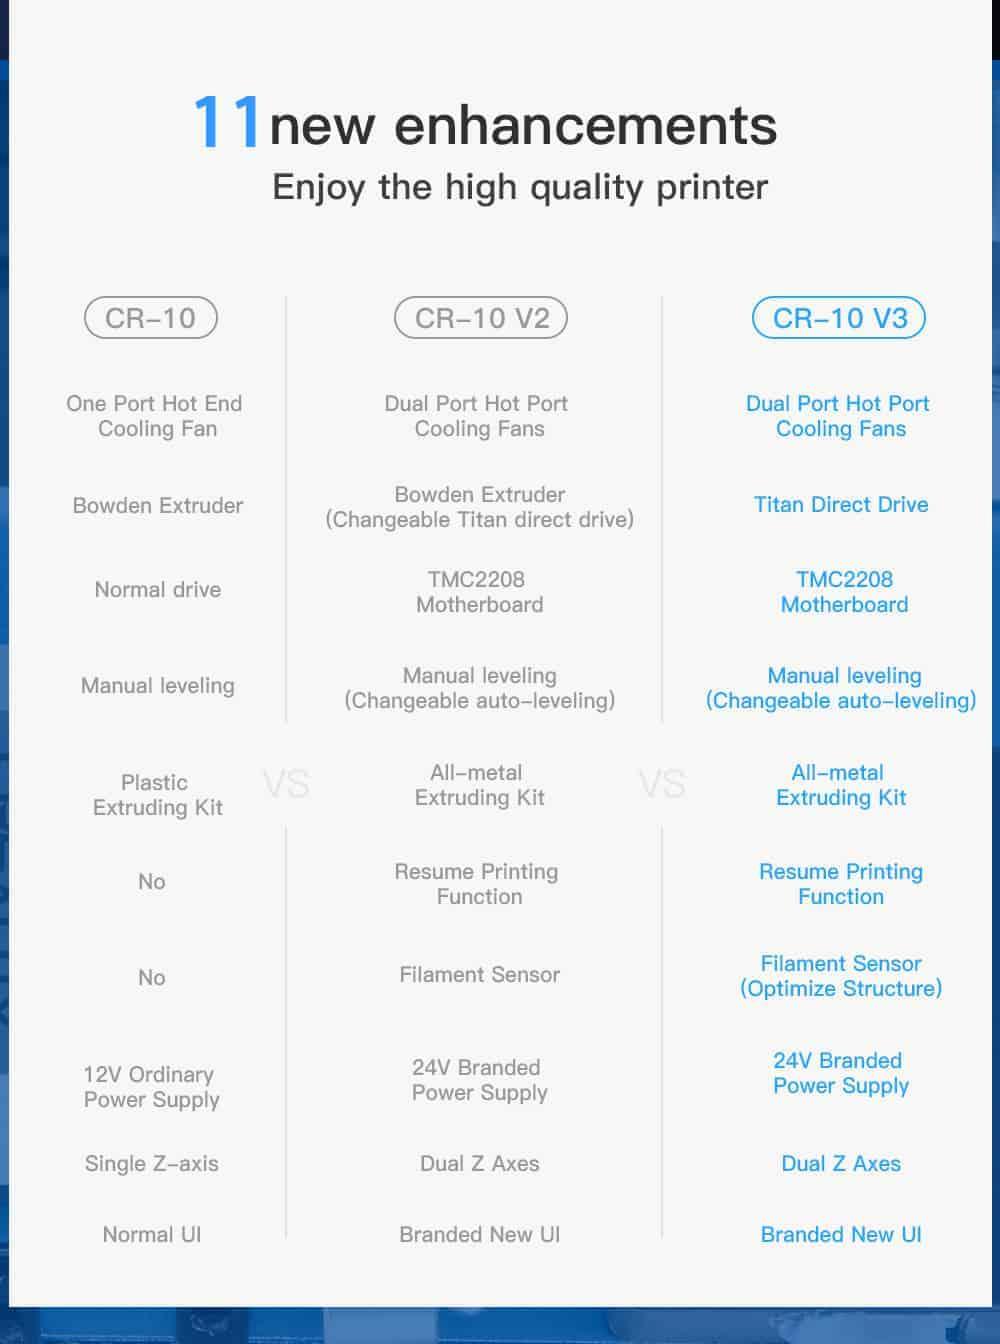 3Dprinteri - CR-10-v3_2